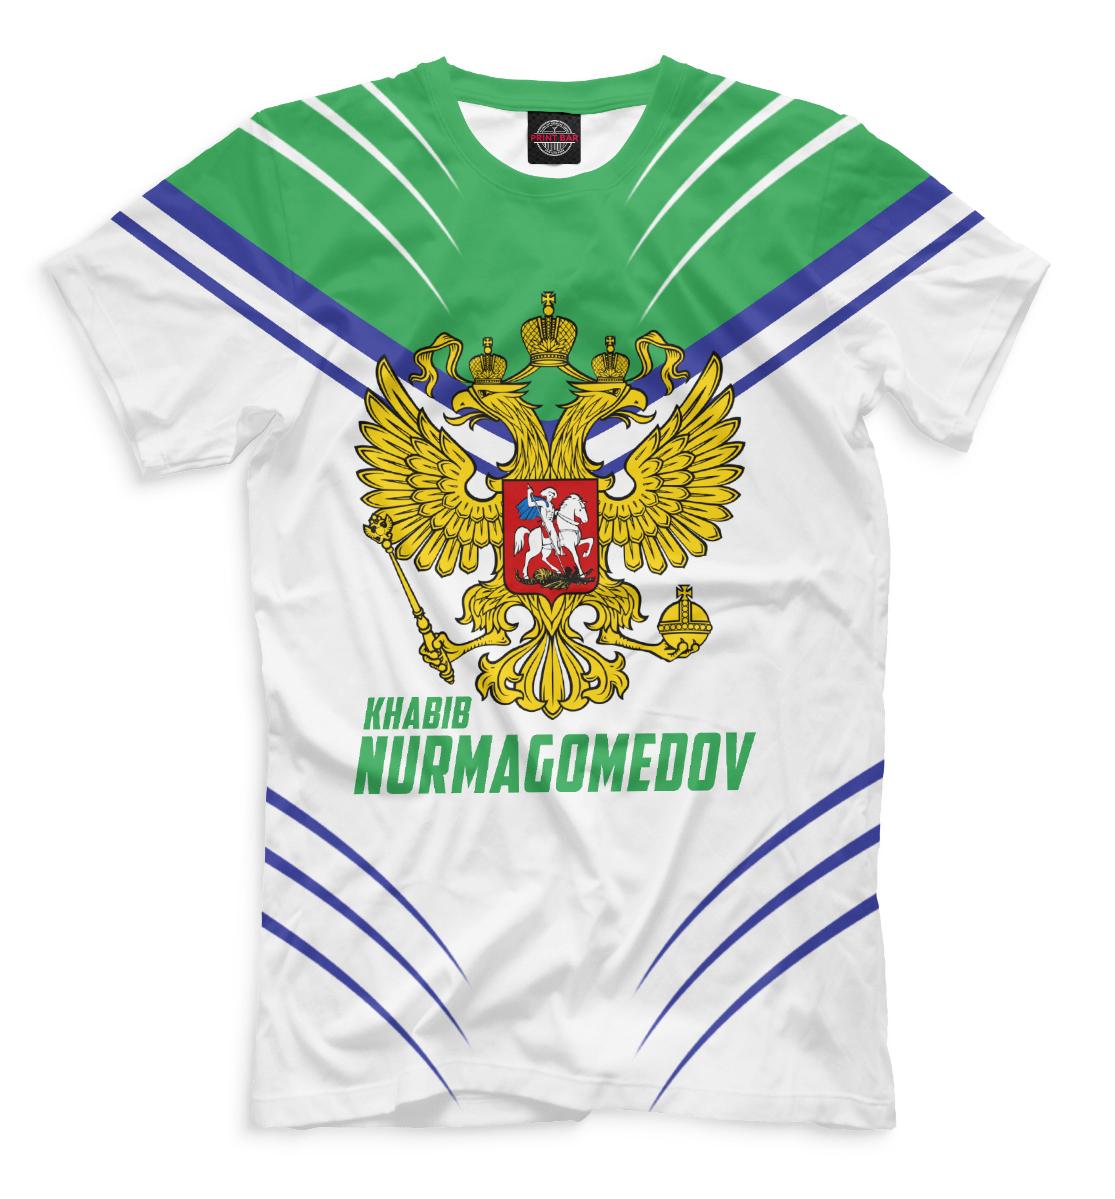 Купить Хабиб Нурмагомедов, Printbar, Футболки, MNU-884871-fut-2